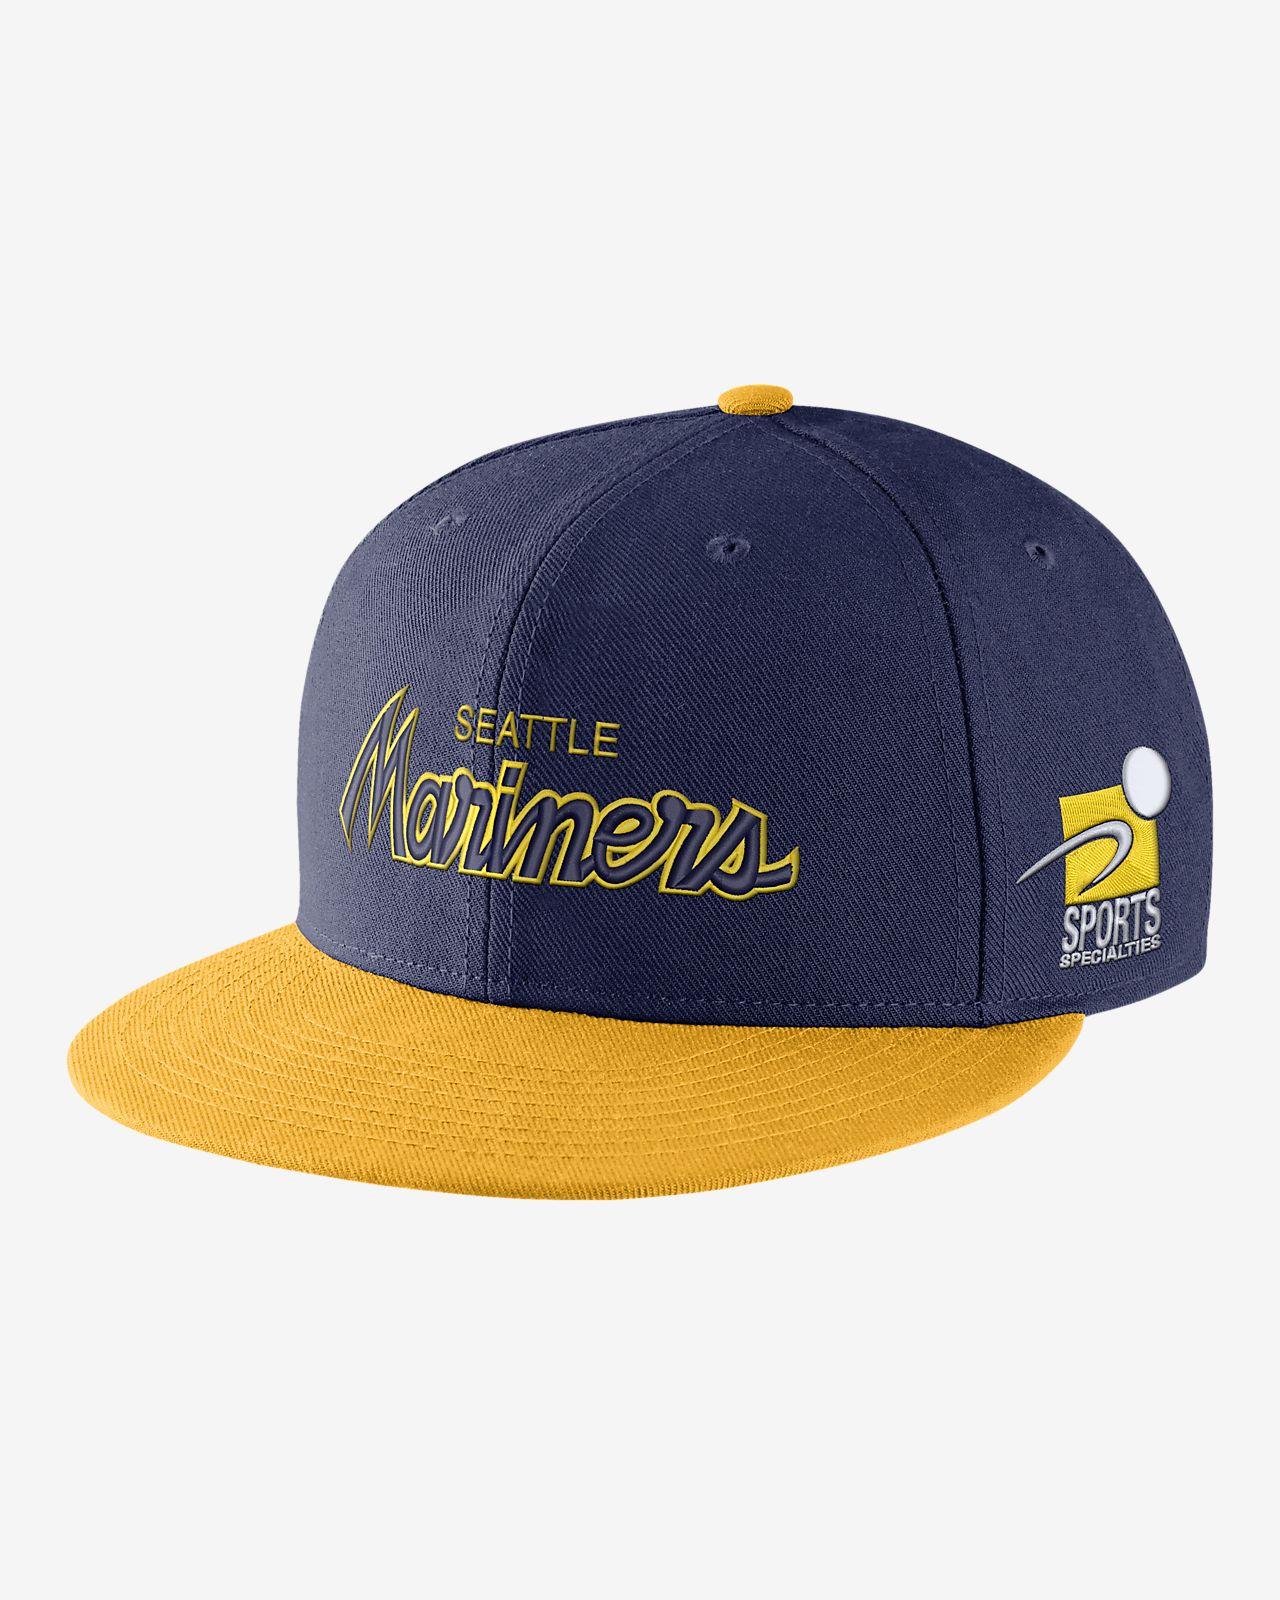 97c2b4894a3 Nike Pro Sport Specialties (MLB Mariners) Adjustable Hat. Nike.com